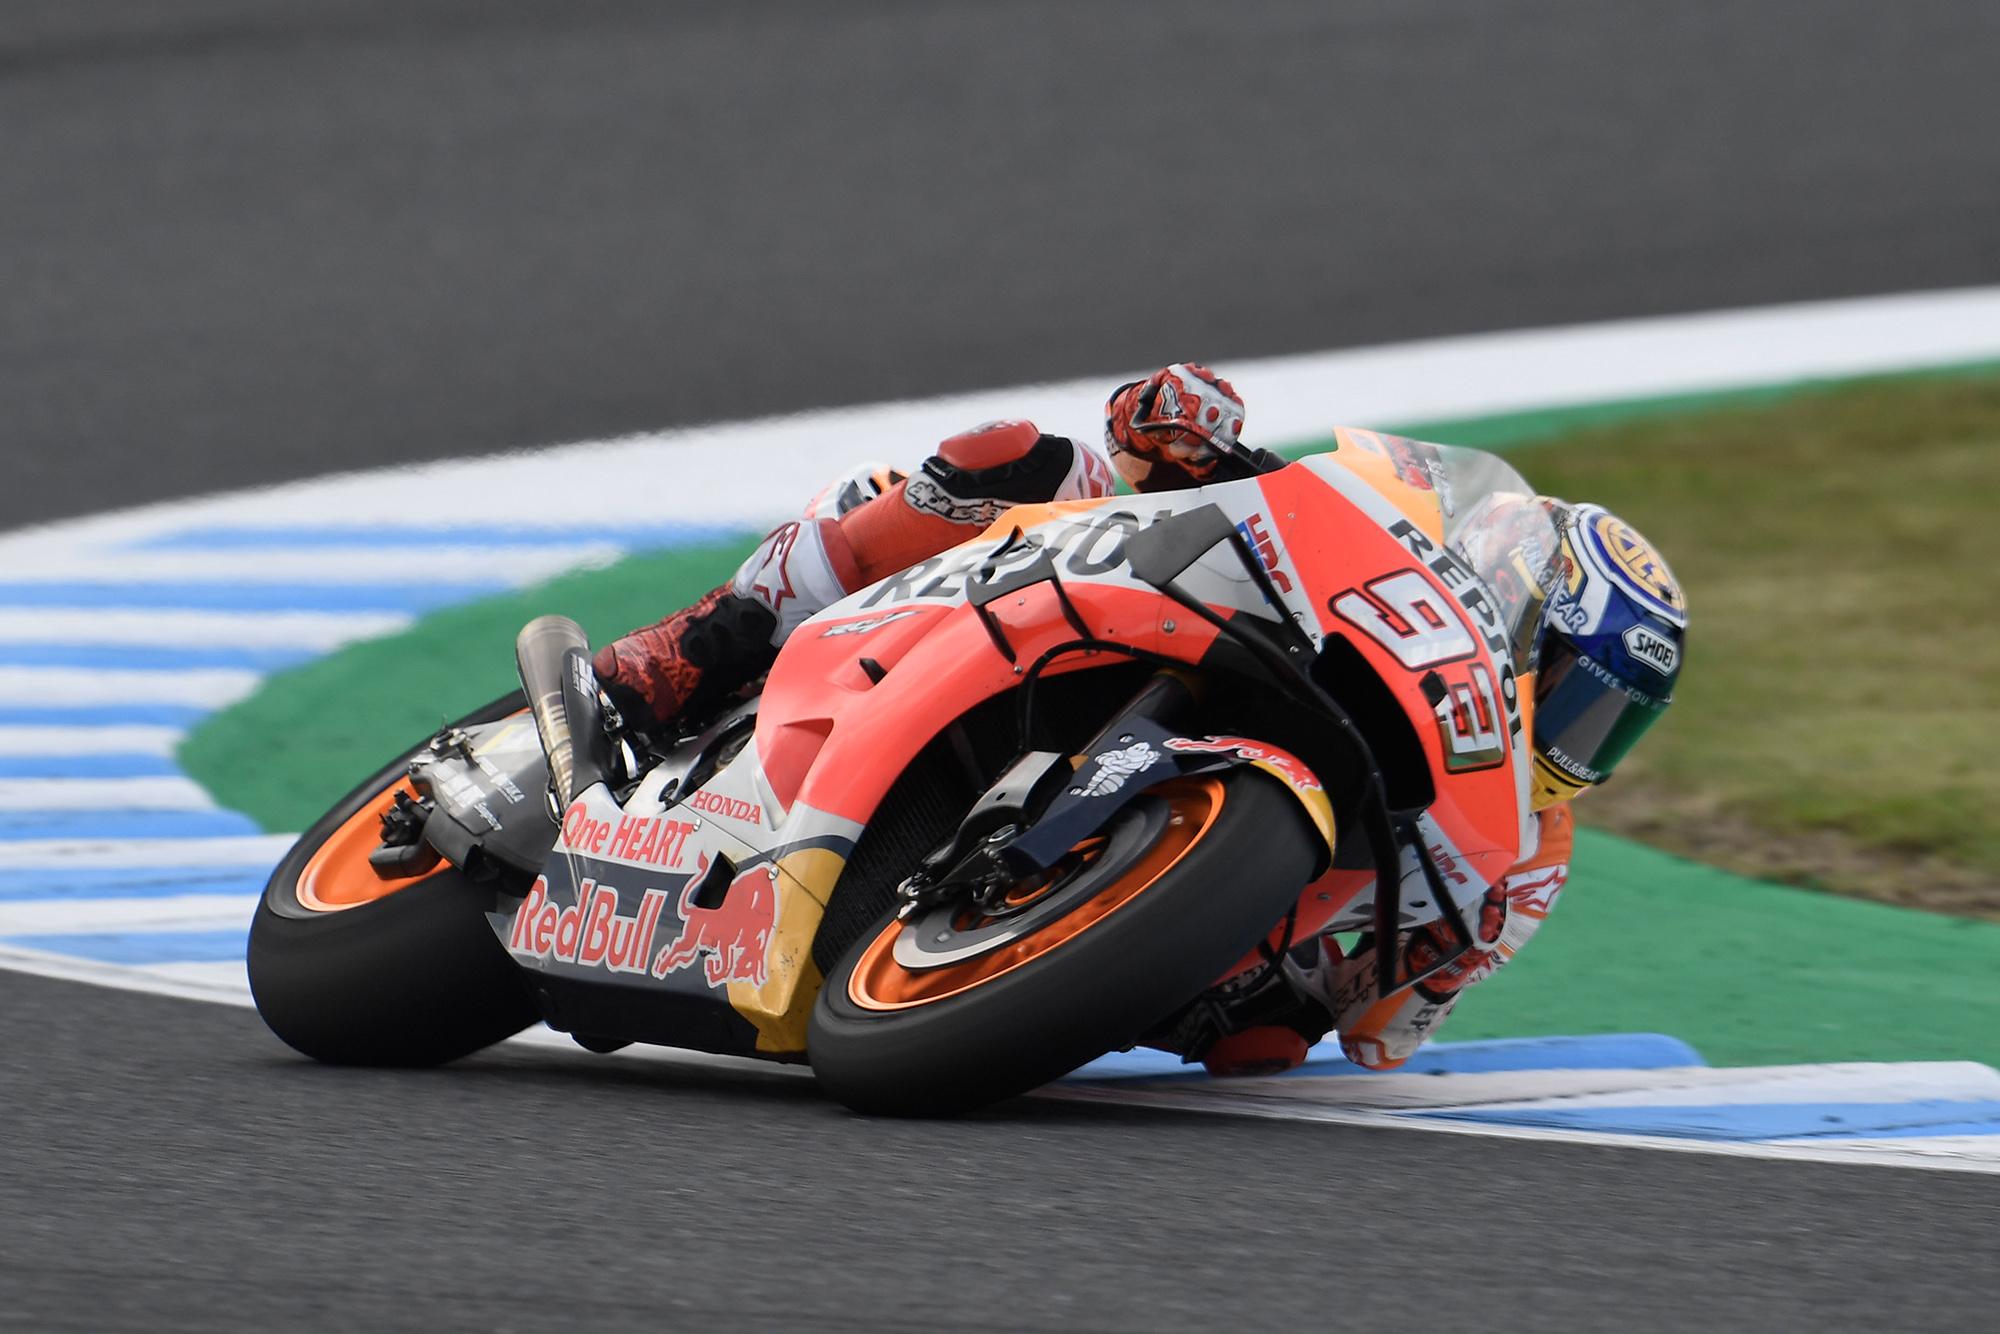 Marc Marquez cornering during the 2019 MotoGP Grand Prix of Japan